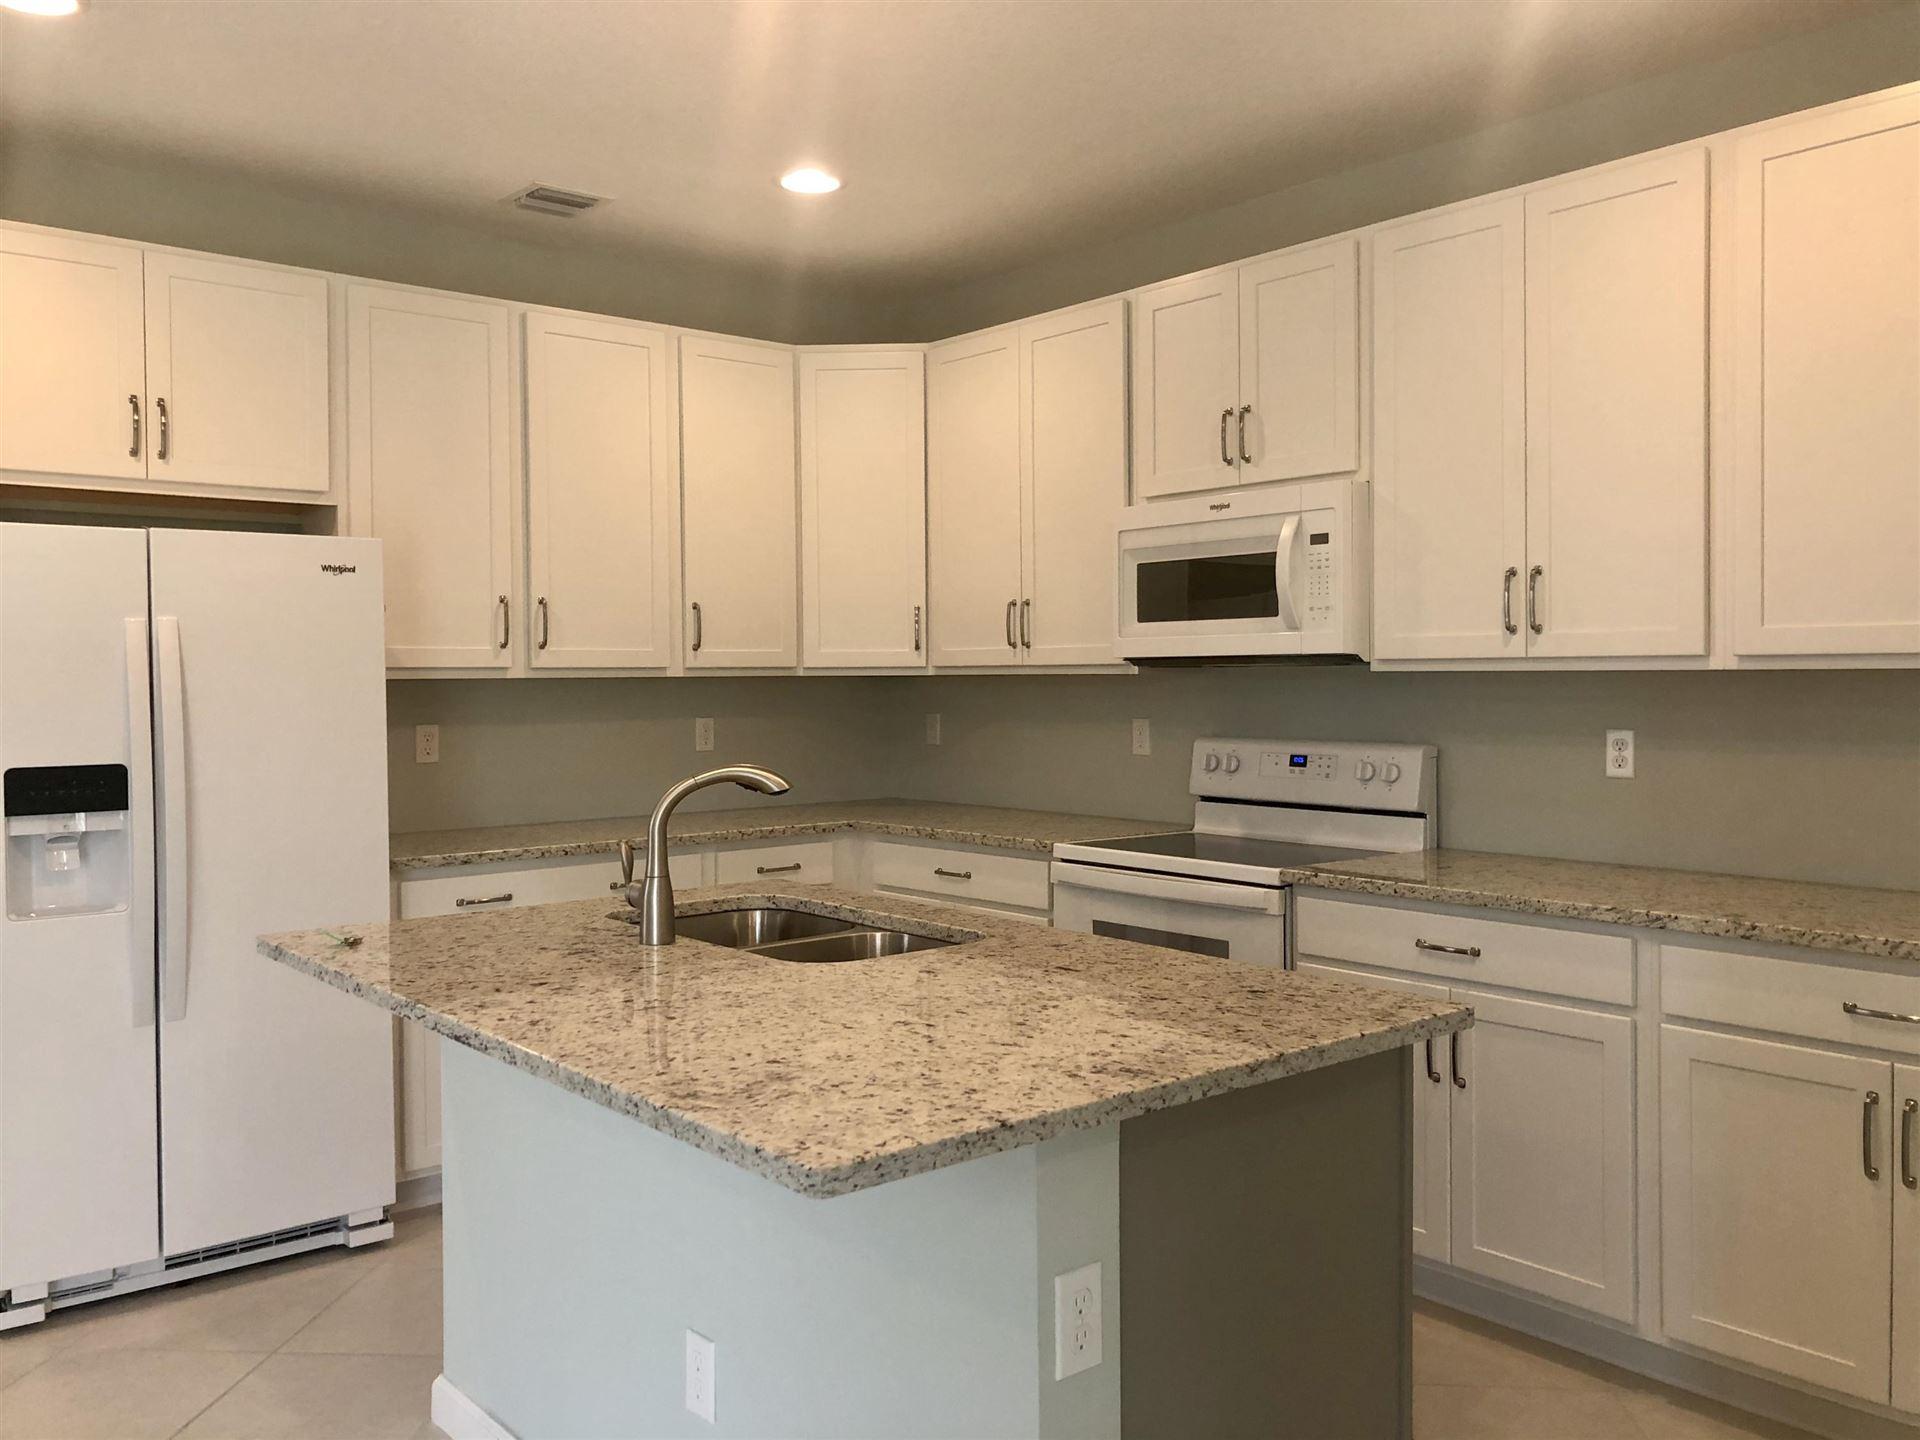 395 NW 33rd Lane, Pompano Beach, FL 33069 - MLS#: RX-10700897